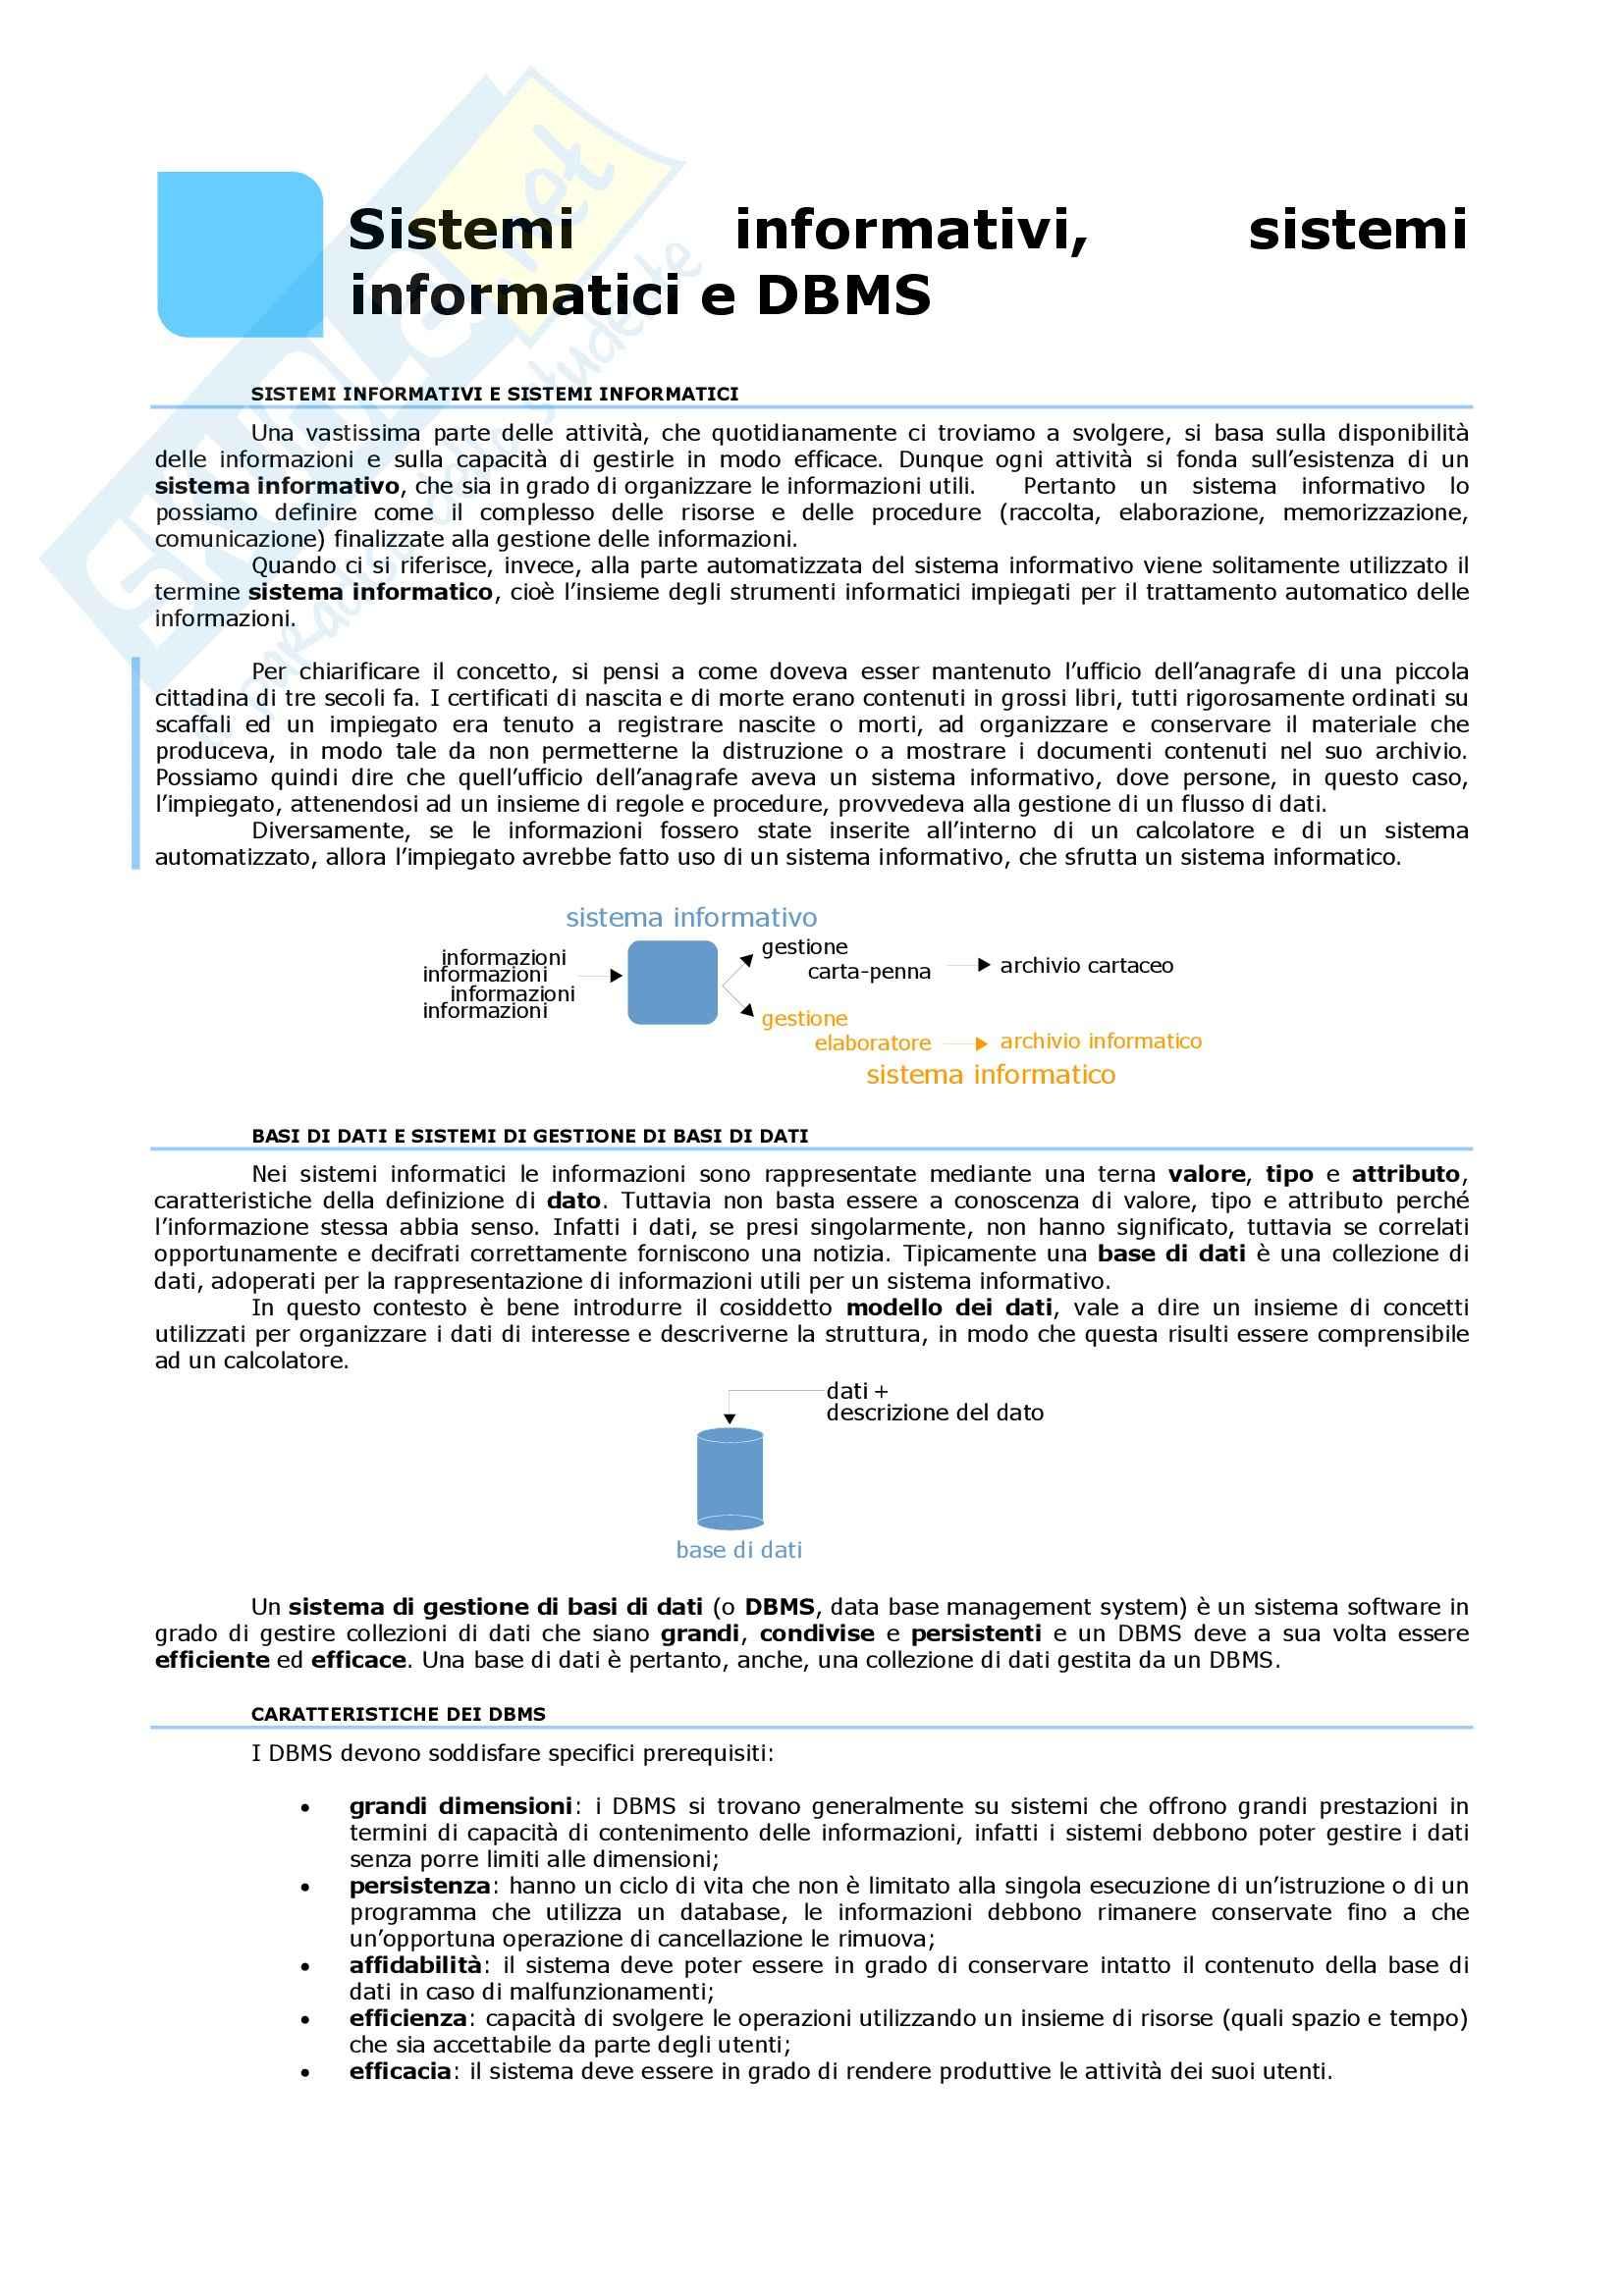 Basi di dati - i sistemi informativi e informatici